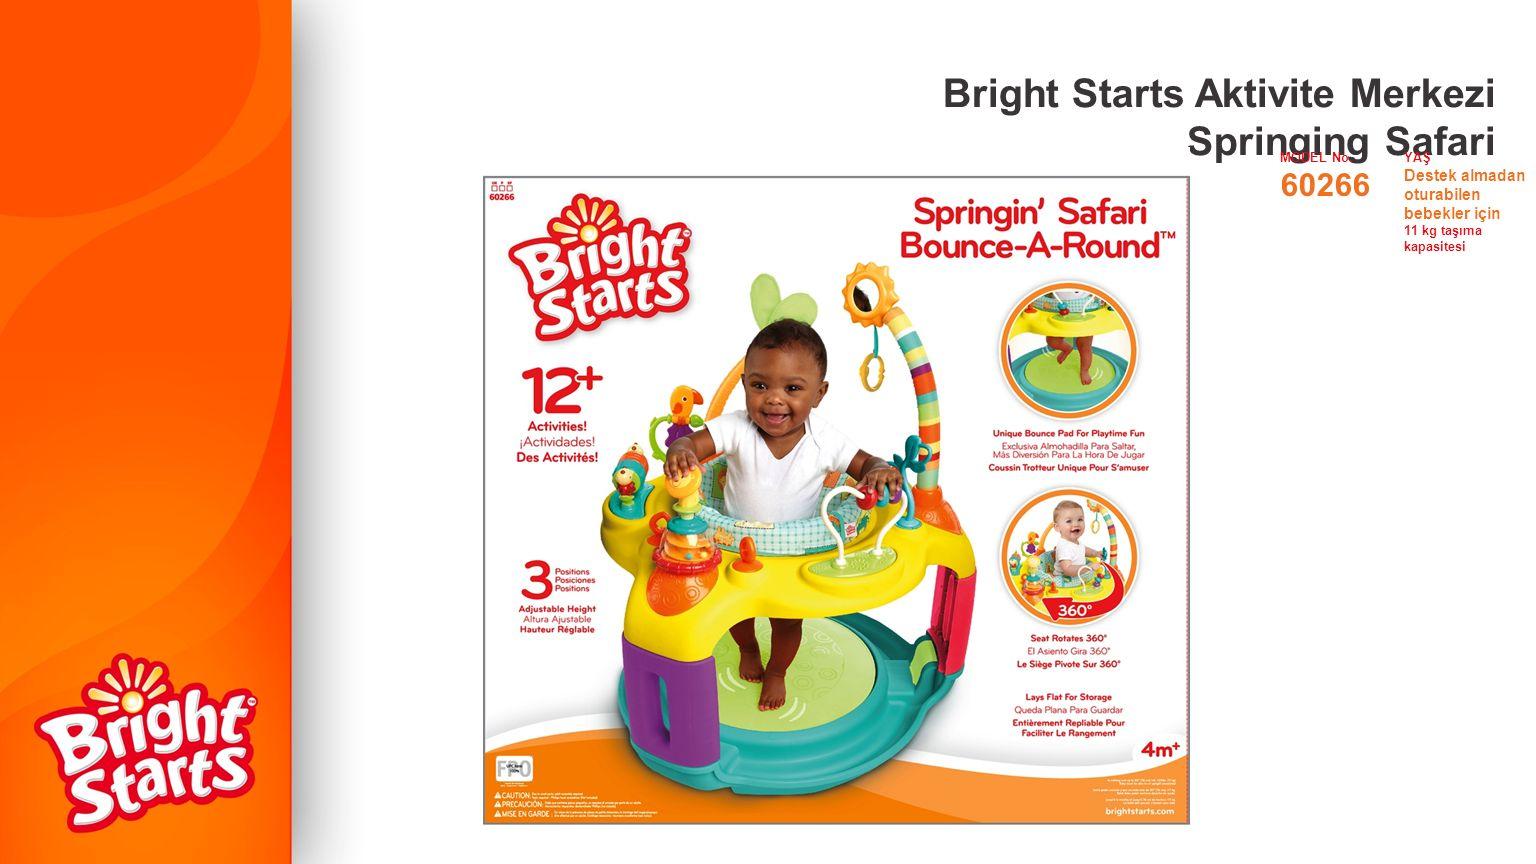 Bright Starts Aktivite Merkezi Springing Safari